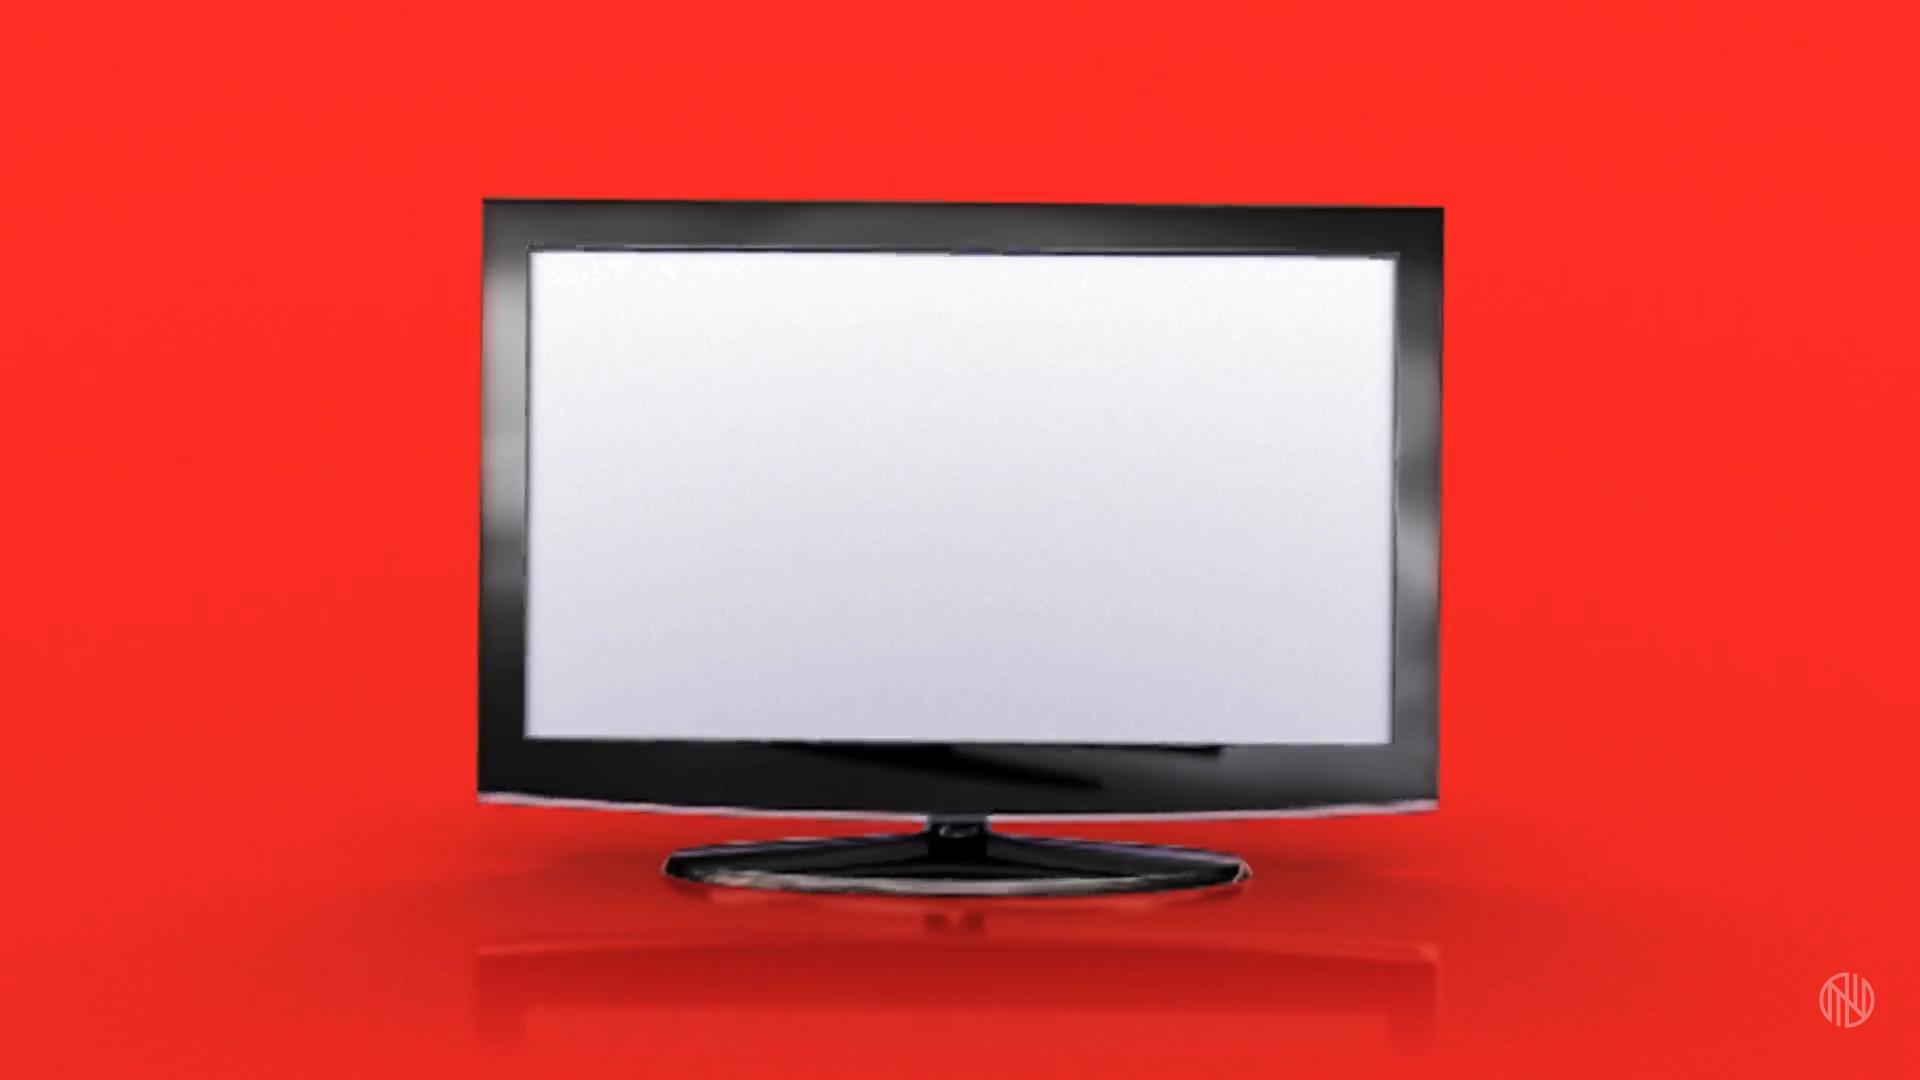 NationalTelevision_Currys HDTV-1.jpg